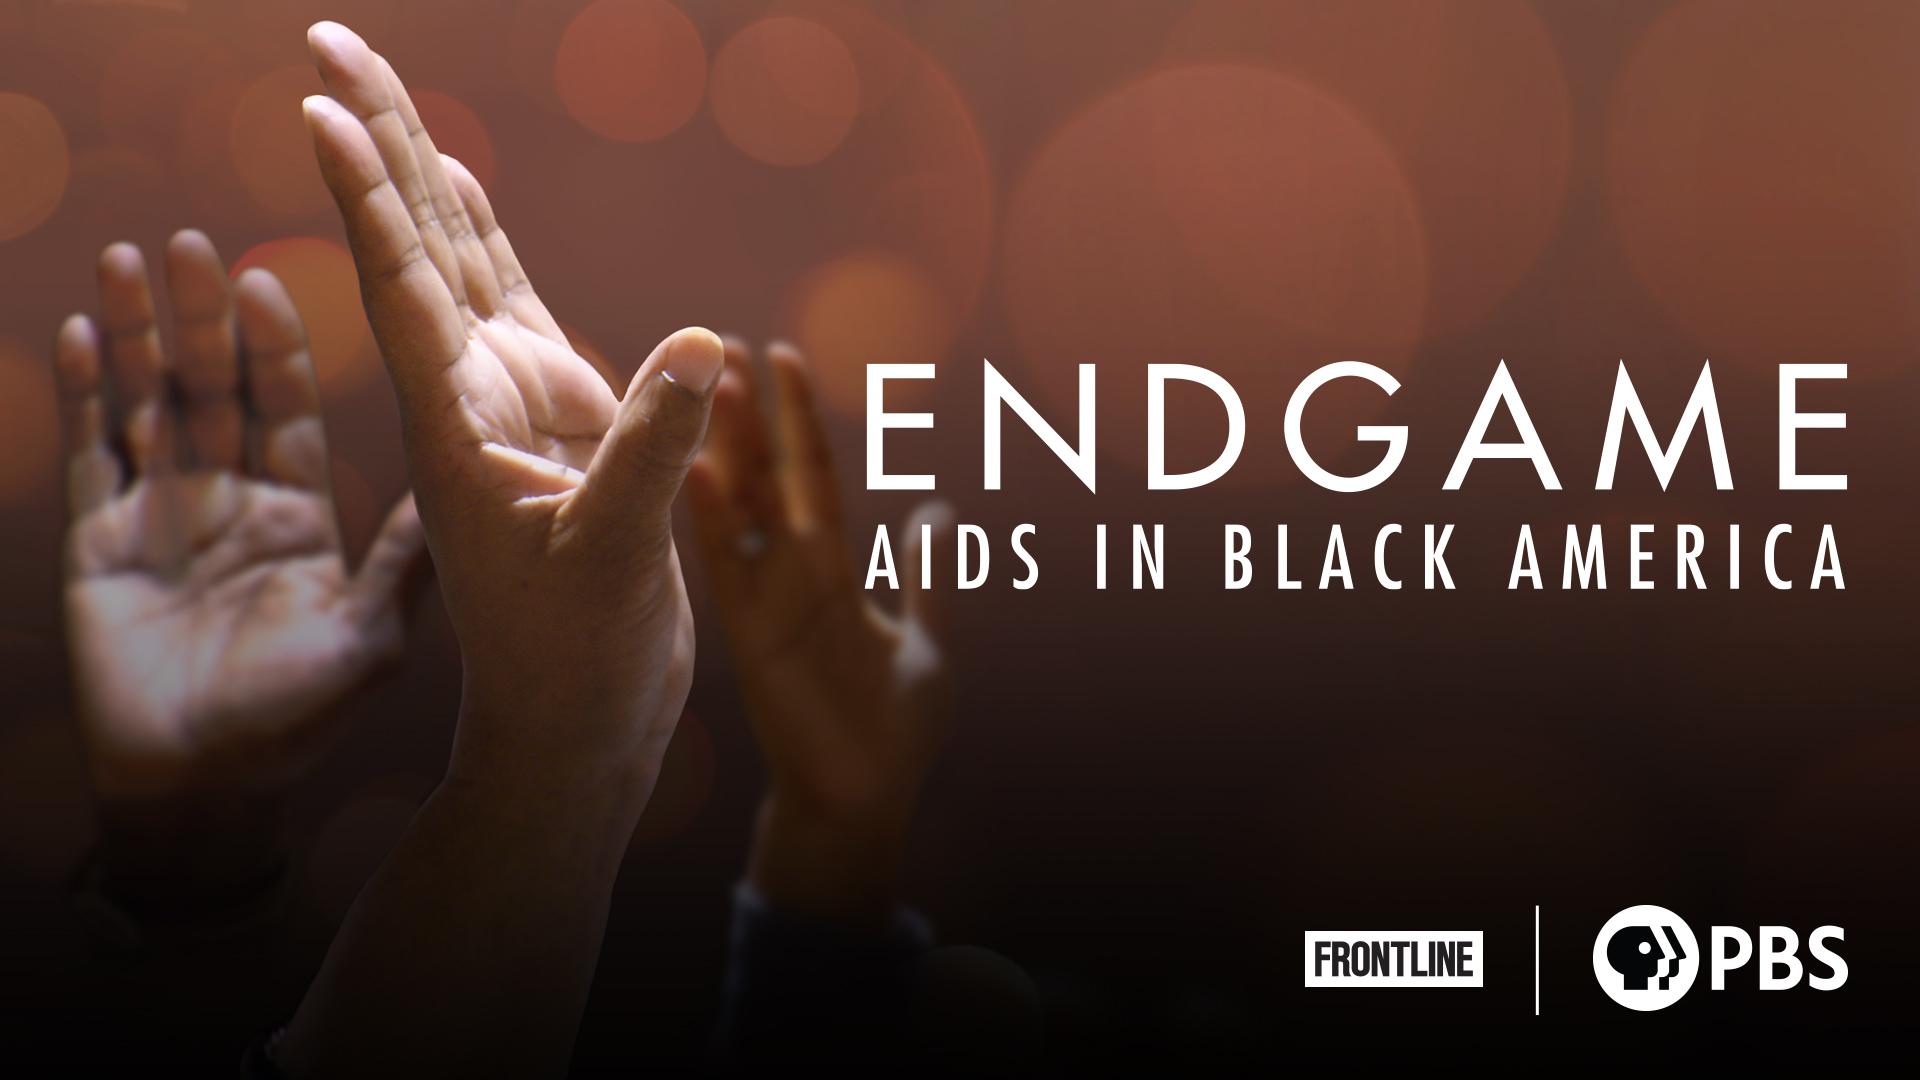 Endgame: AIDS in Black America